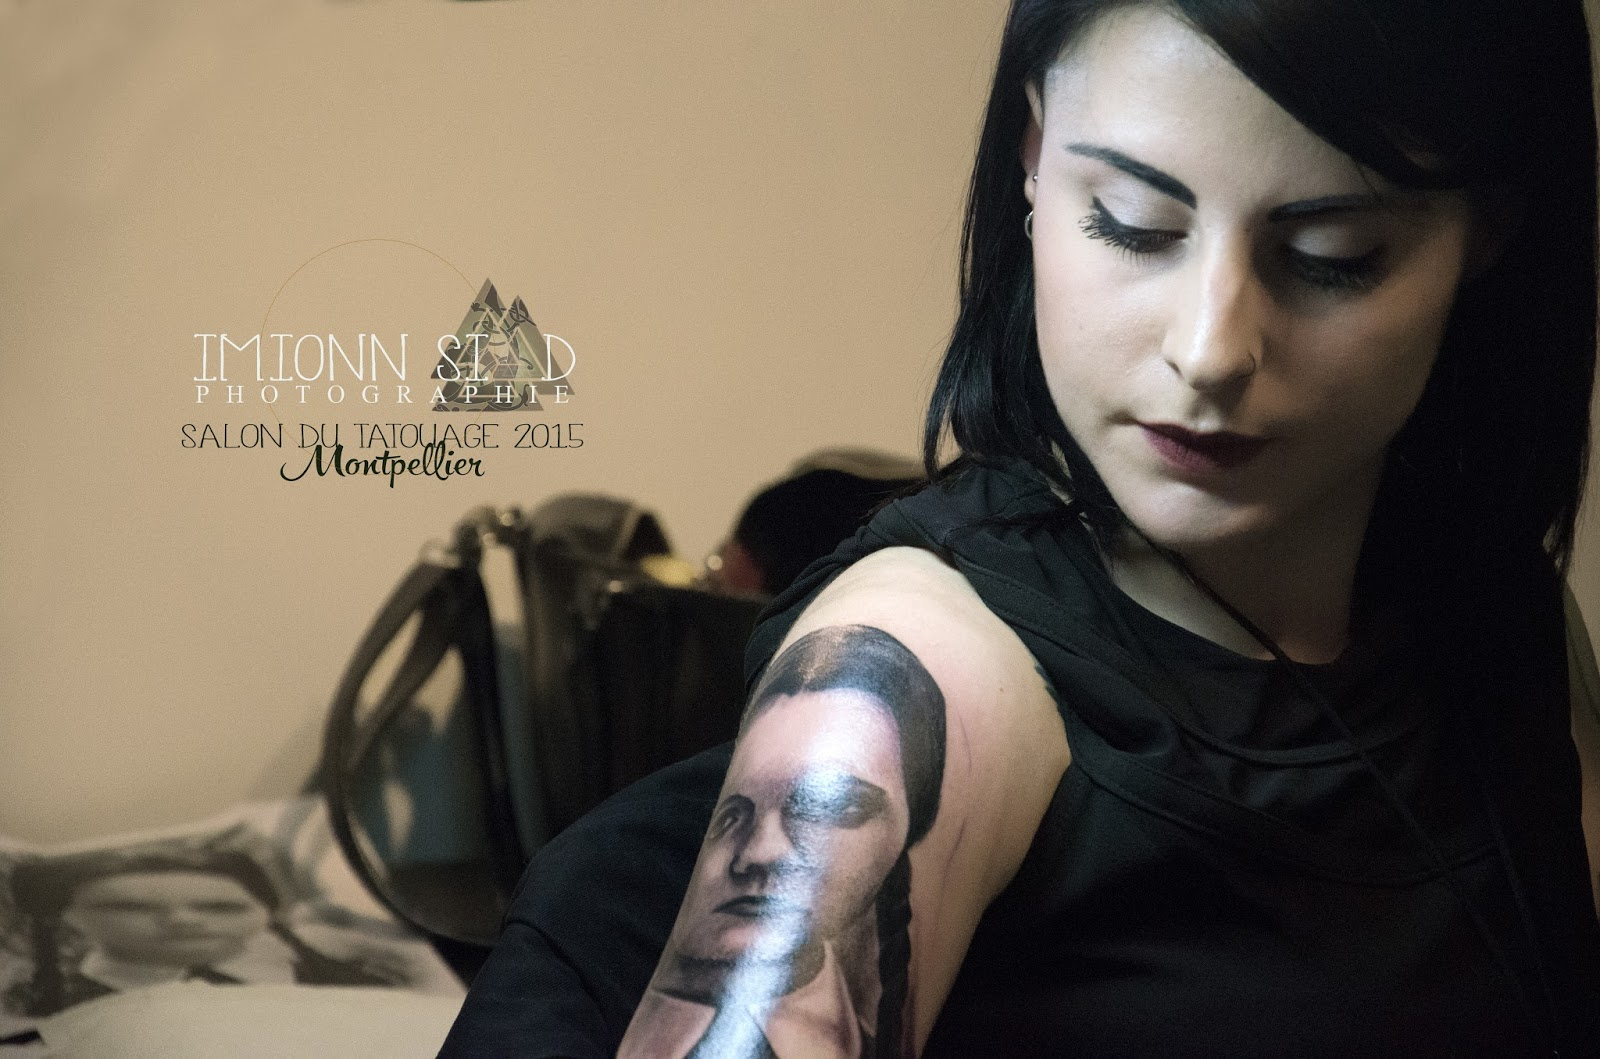 Salon De Tatouage Montpellier - Badabing Tattoo Shop